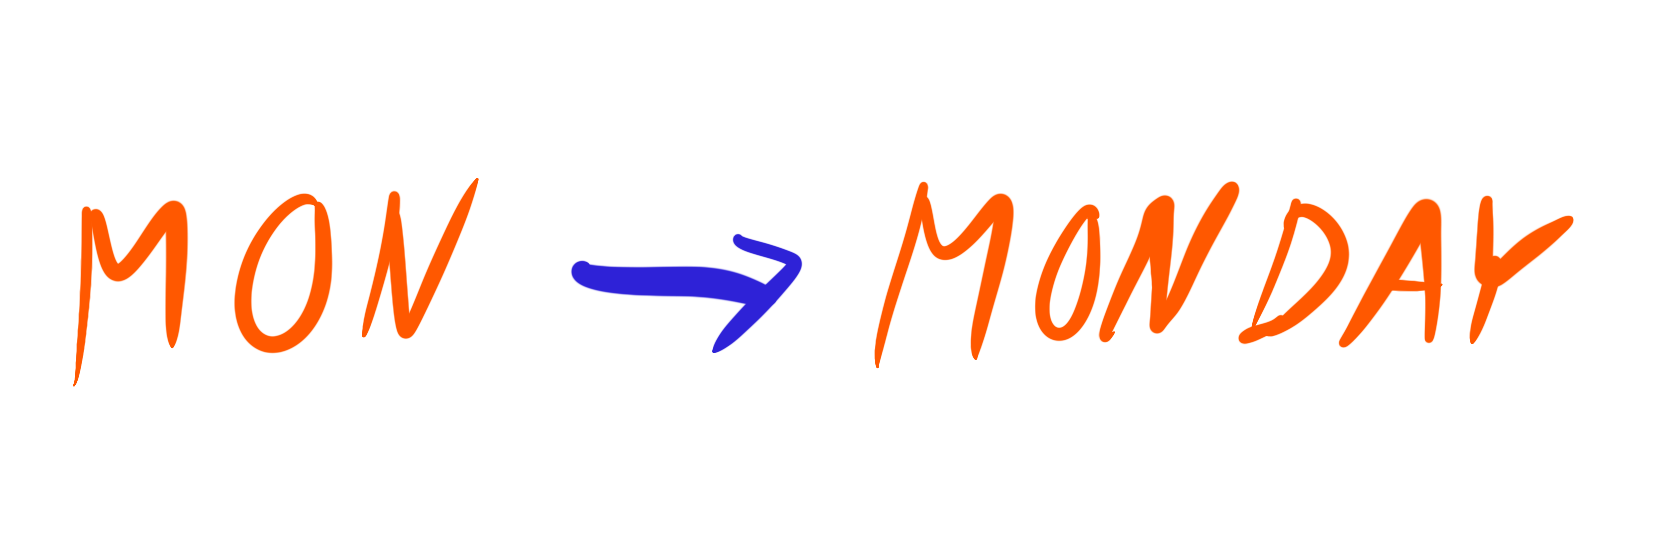 abbreaviation ilustration